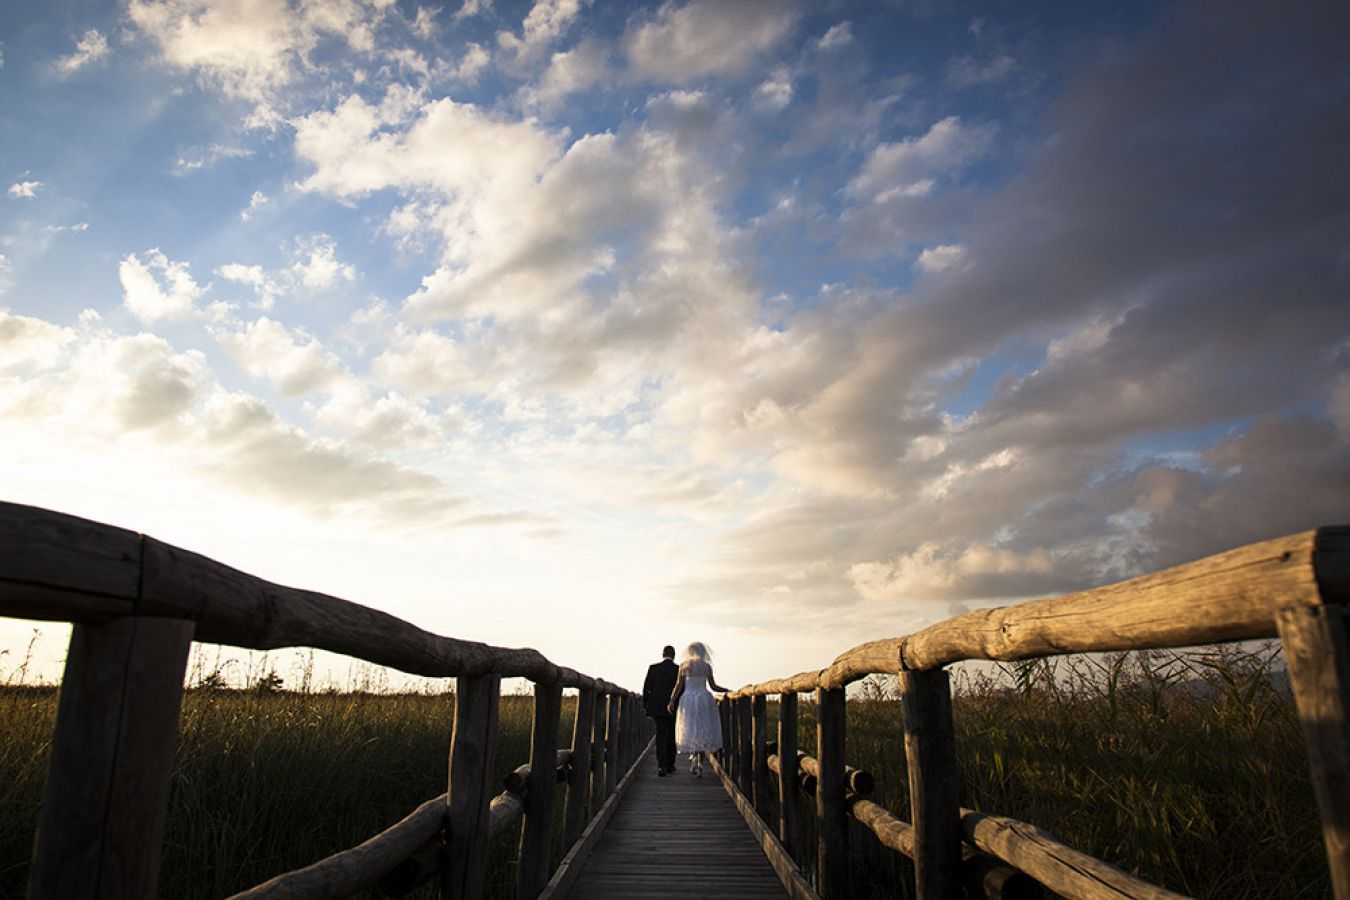 Matrimonio Sul Lago Toscana : Matrimonio sul lago di massaciuccoli